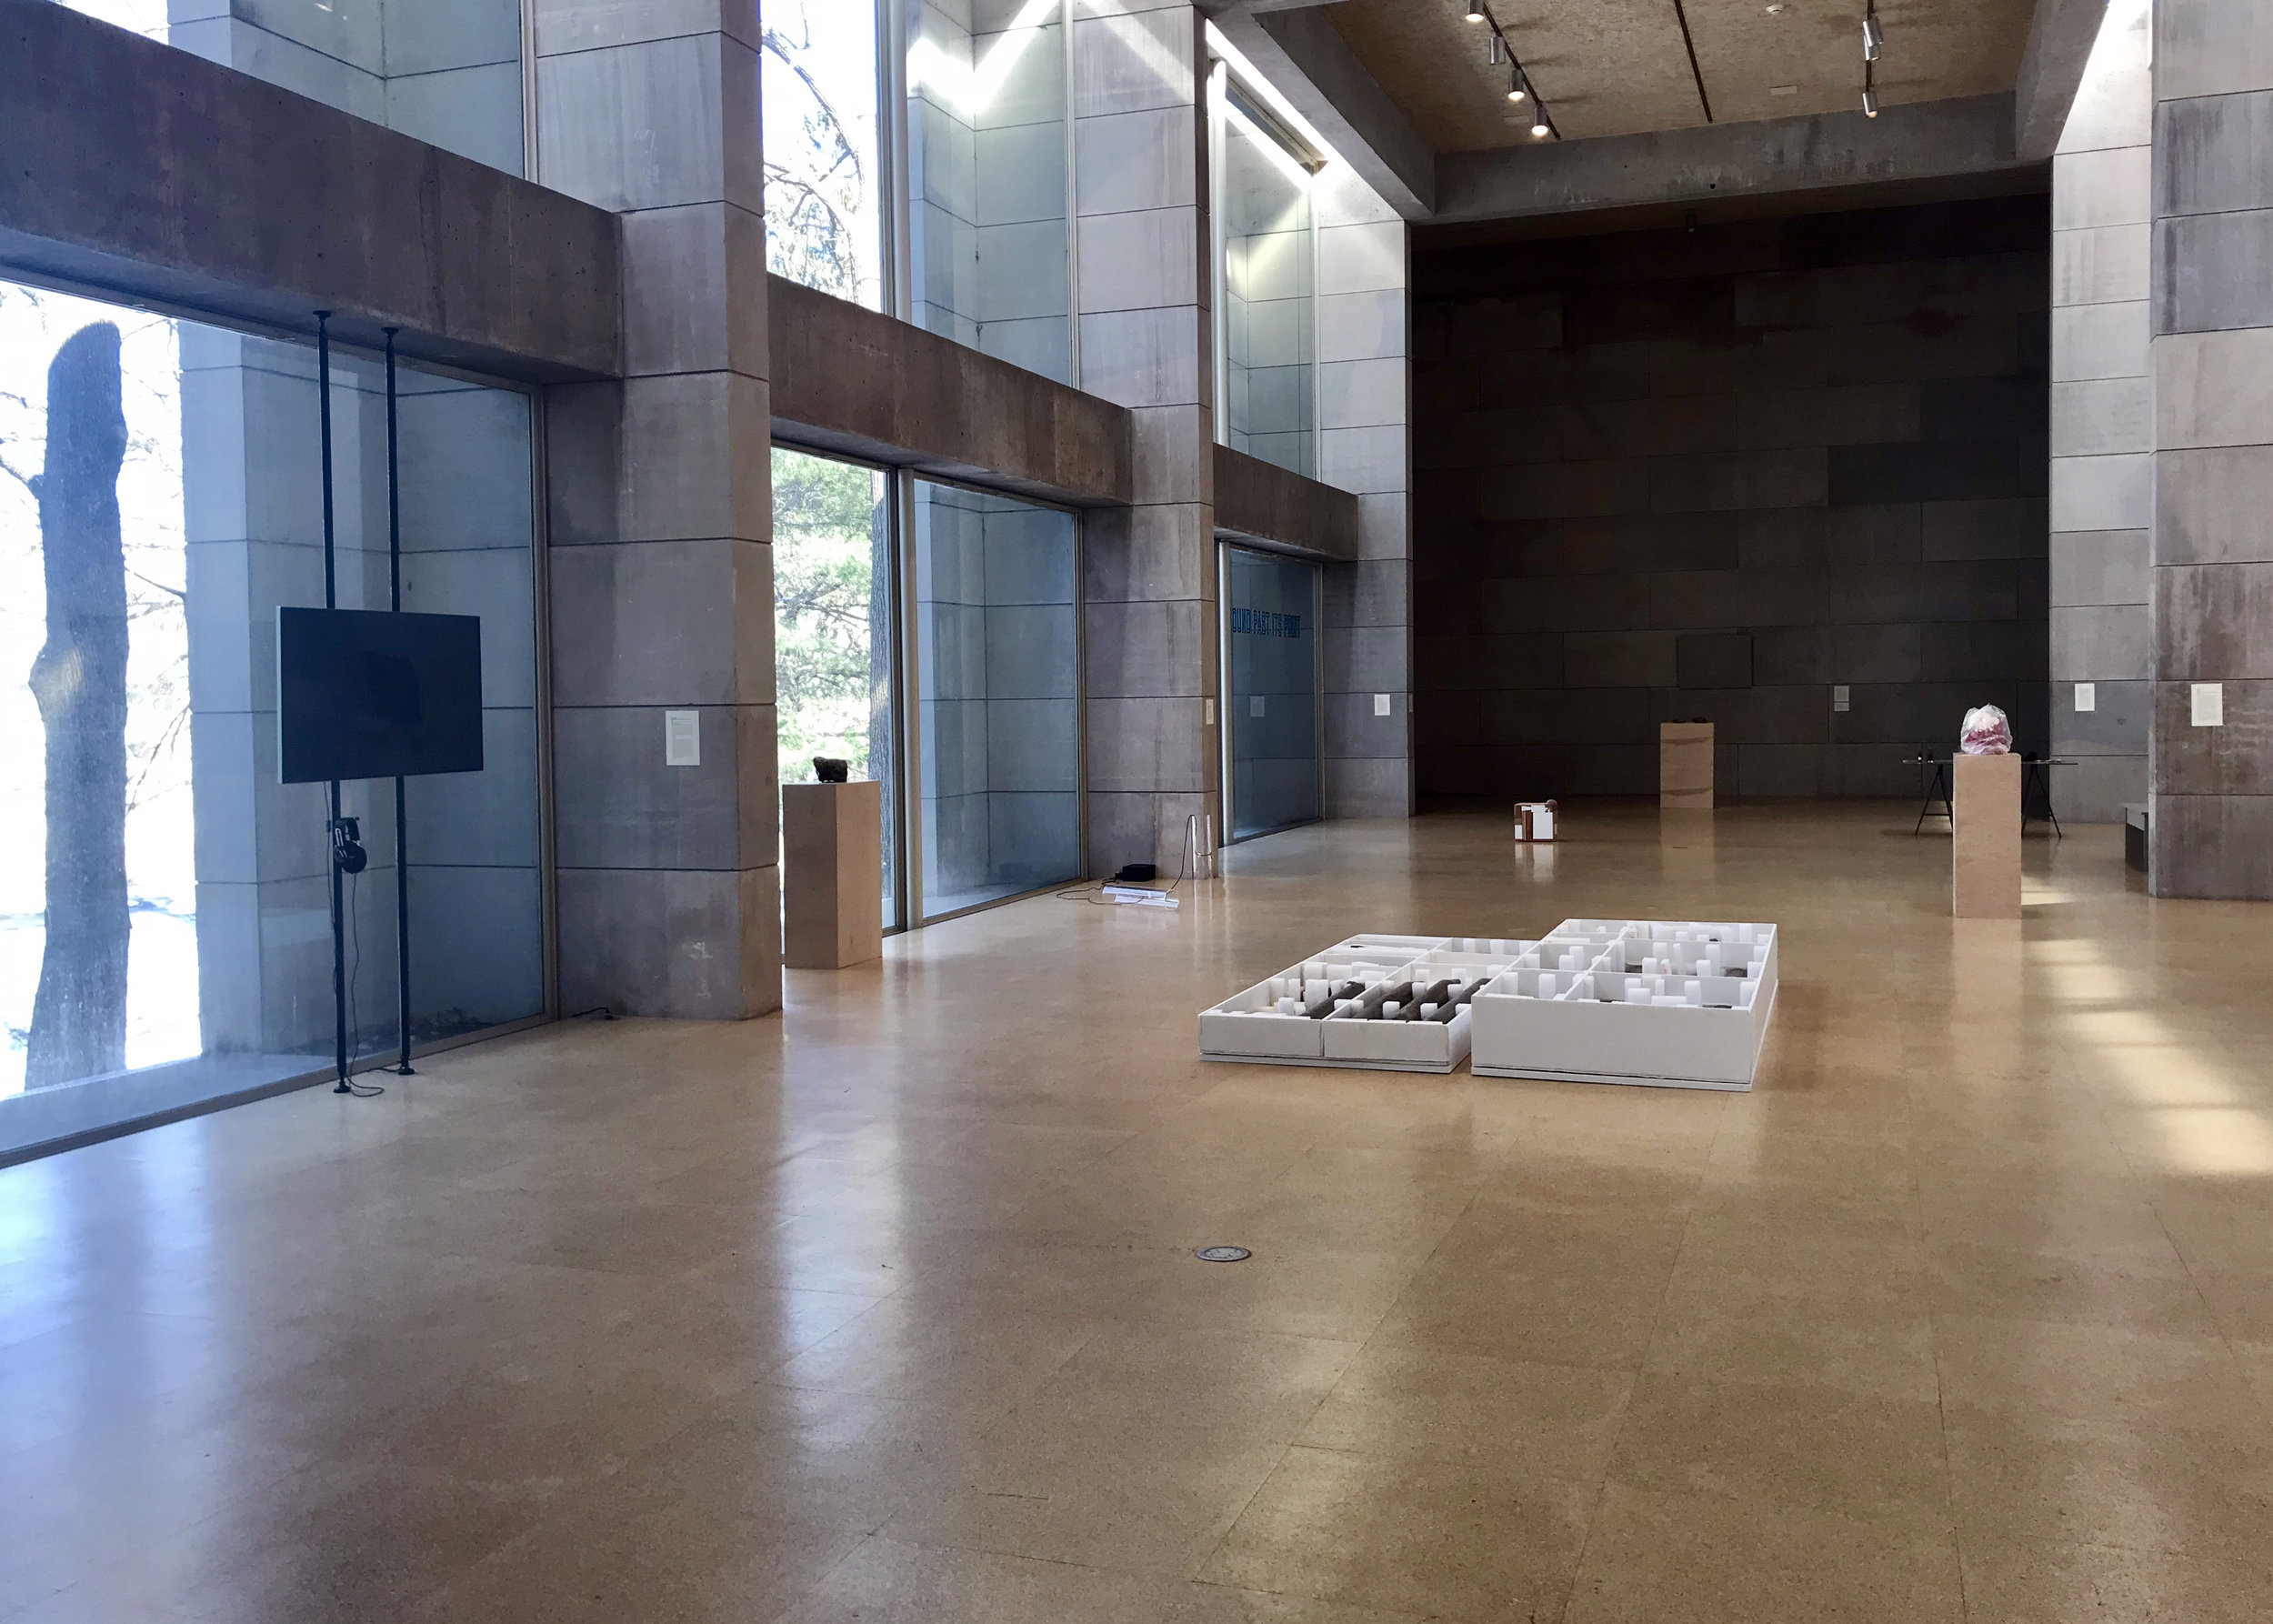 Audible Bacillus  Installation view, Zilkha Gallery, Wesleyan University. Image: J. Gleisner.